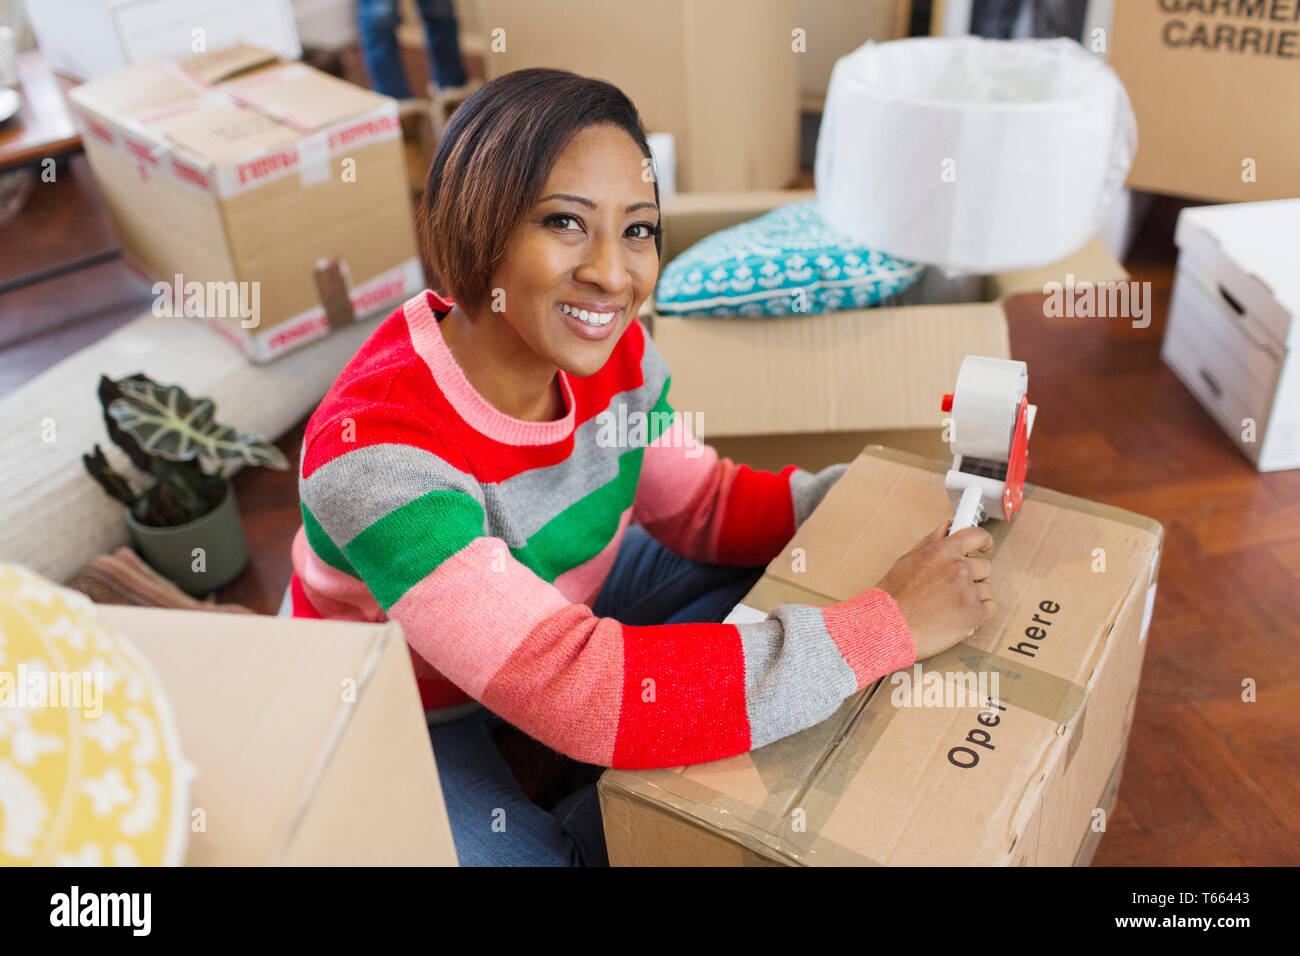 Porträt Lächeln, selbstbewusste Frau Verpackung Kisten Stockfoto